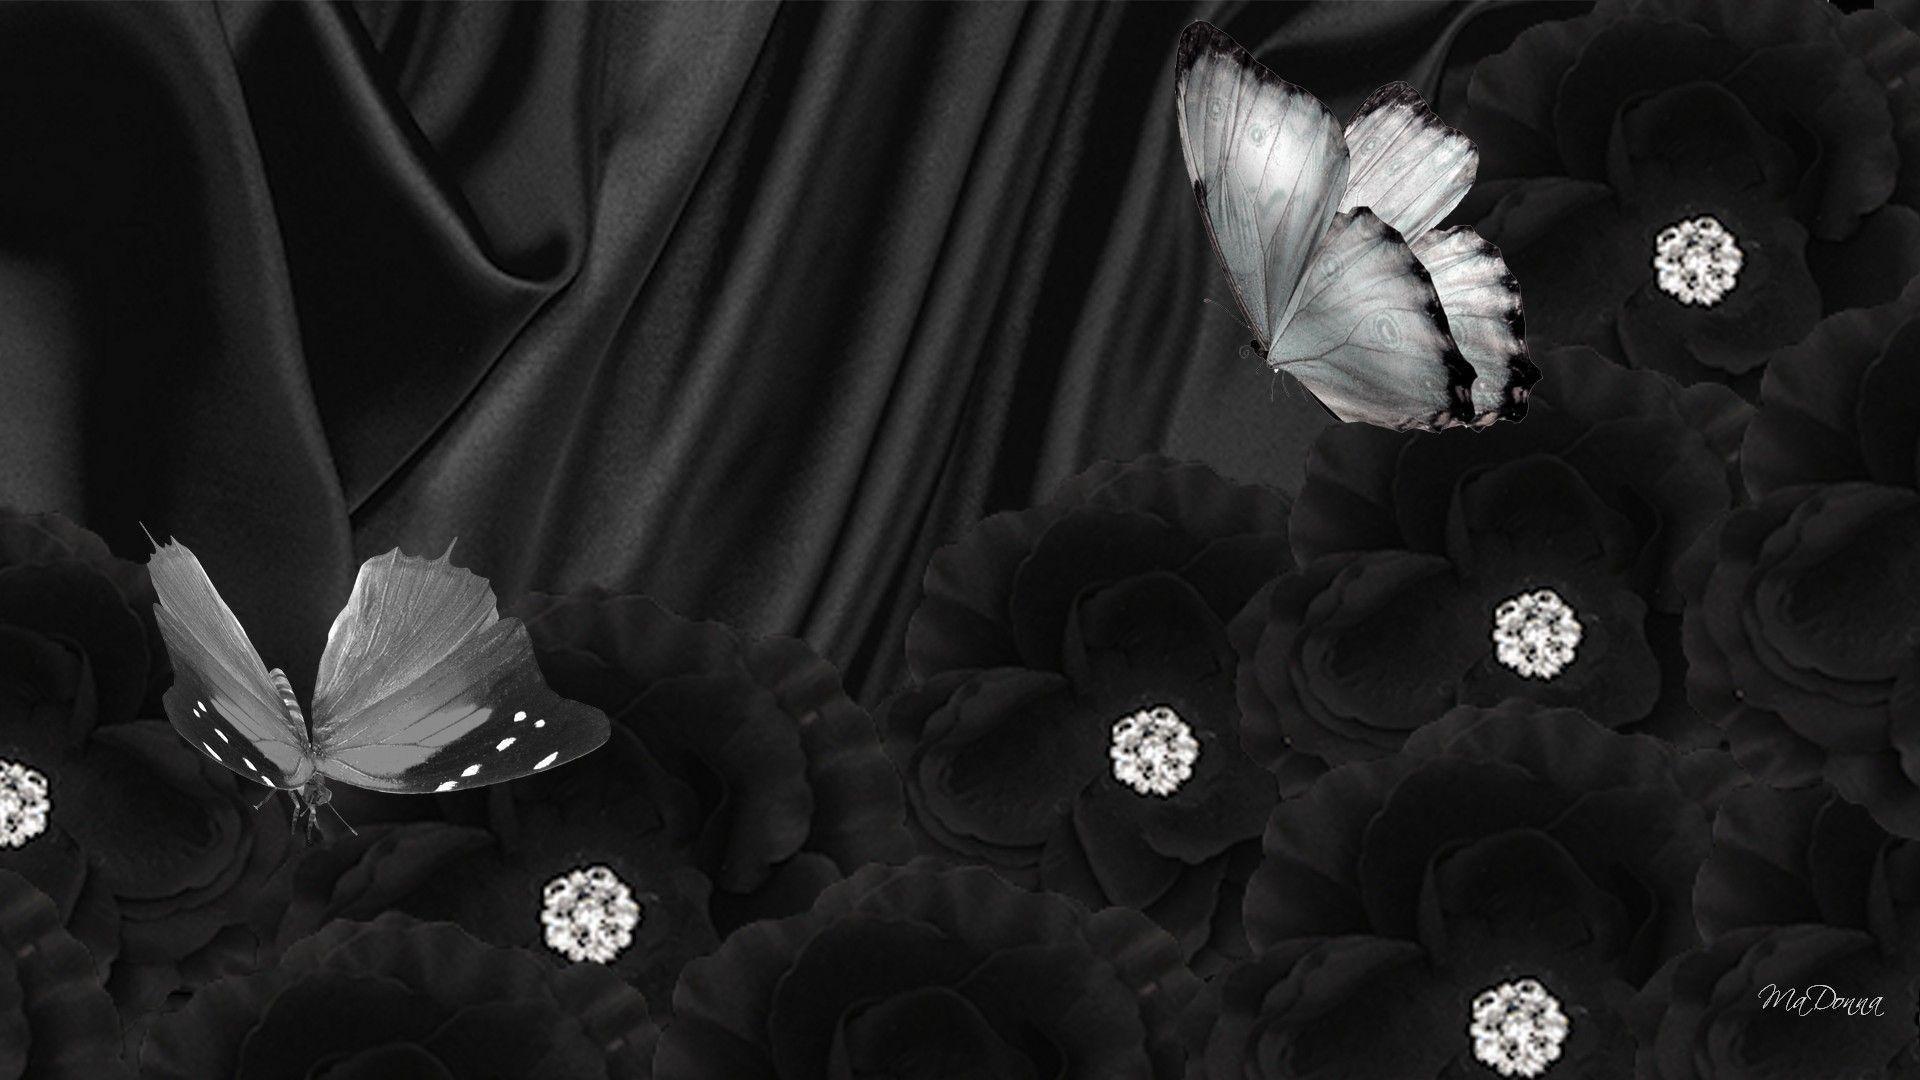 обои на рабочий стол белая бабочка с бриллиантами на черном фоне